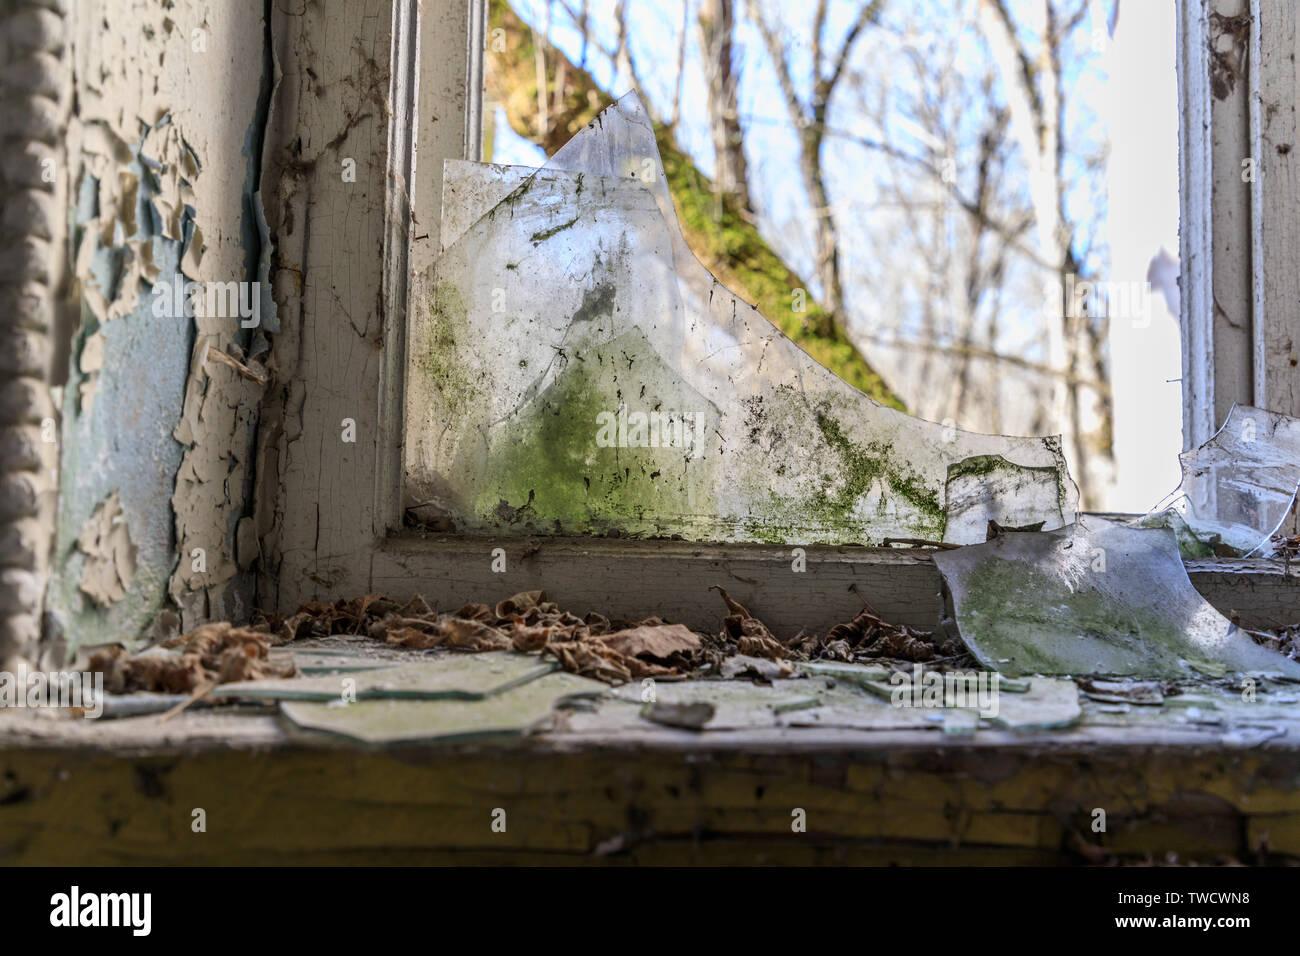 Eastern Europe, Ukraine, Pripyat, Chernobyl. Peeling paint. Broken glass, window. - Stock Image